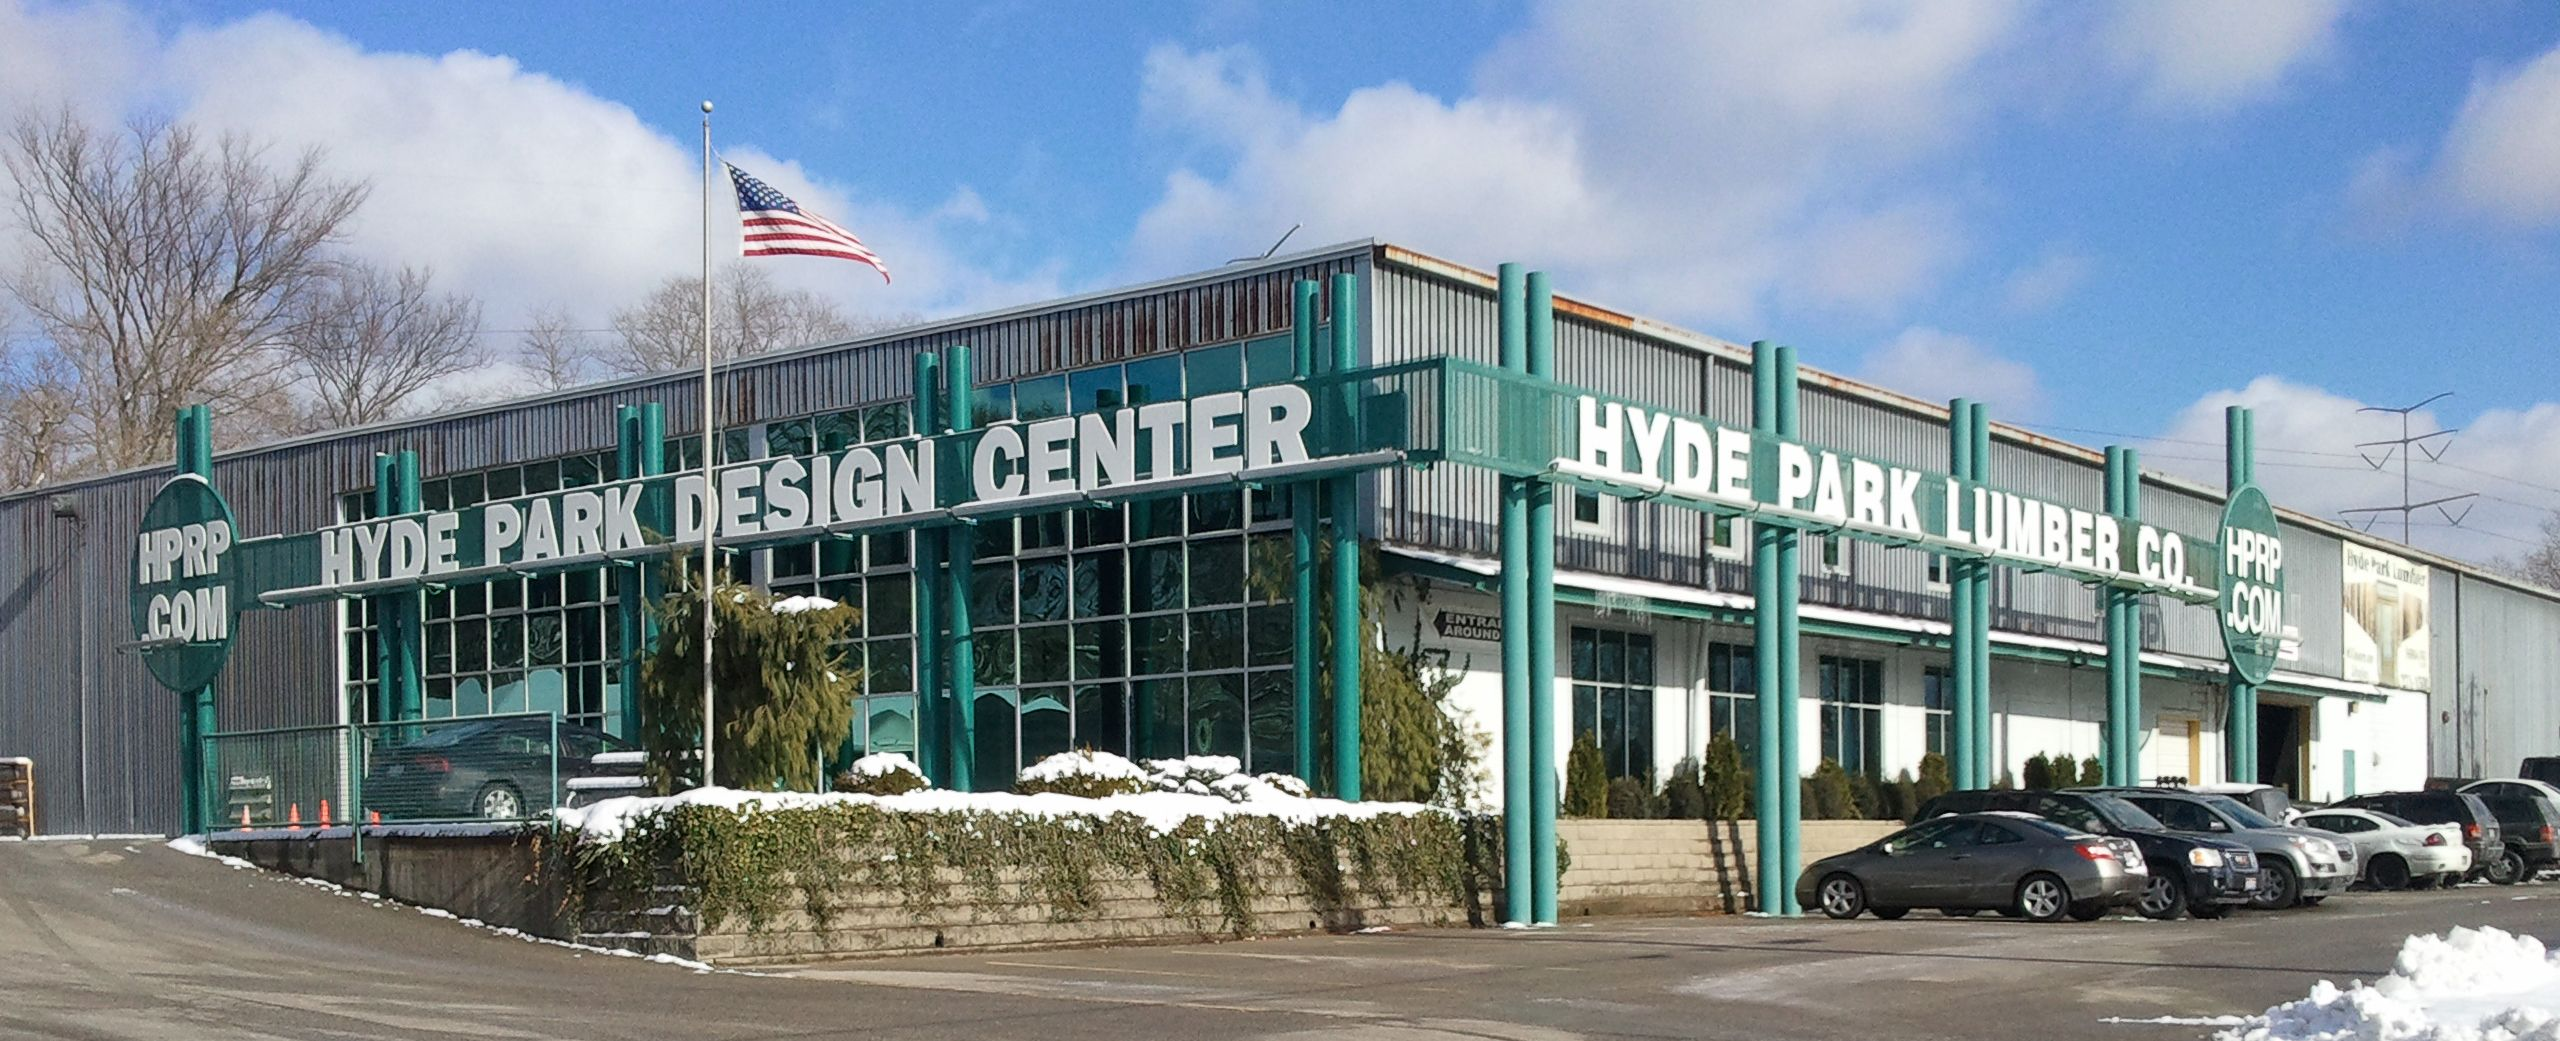 Design For Less Home Center Pr Hyde Park Lumber And Design Center Cincinnati To Host